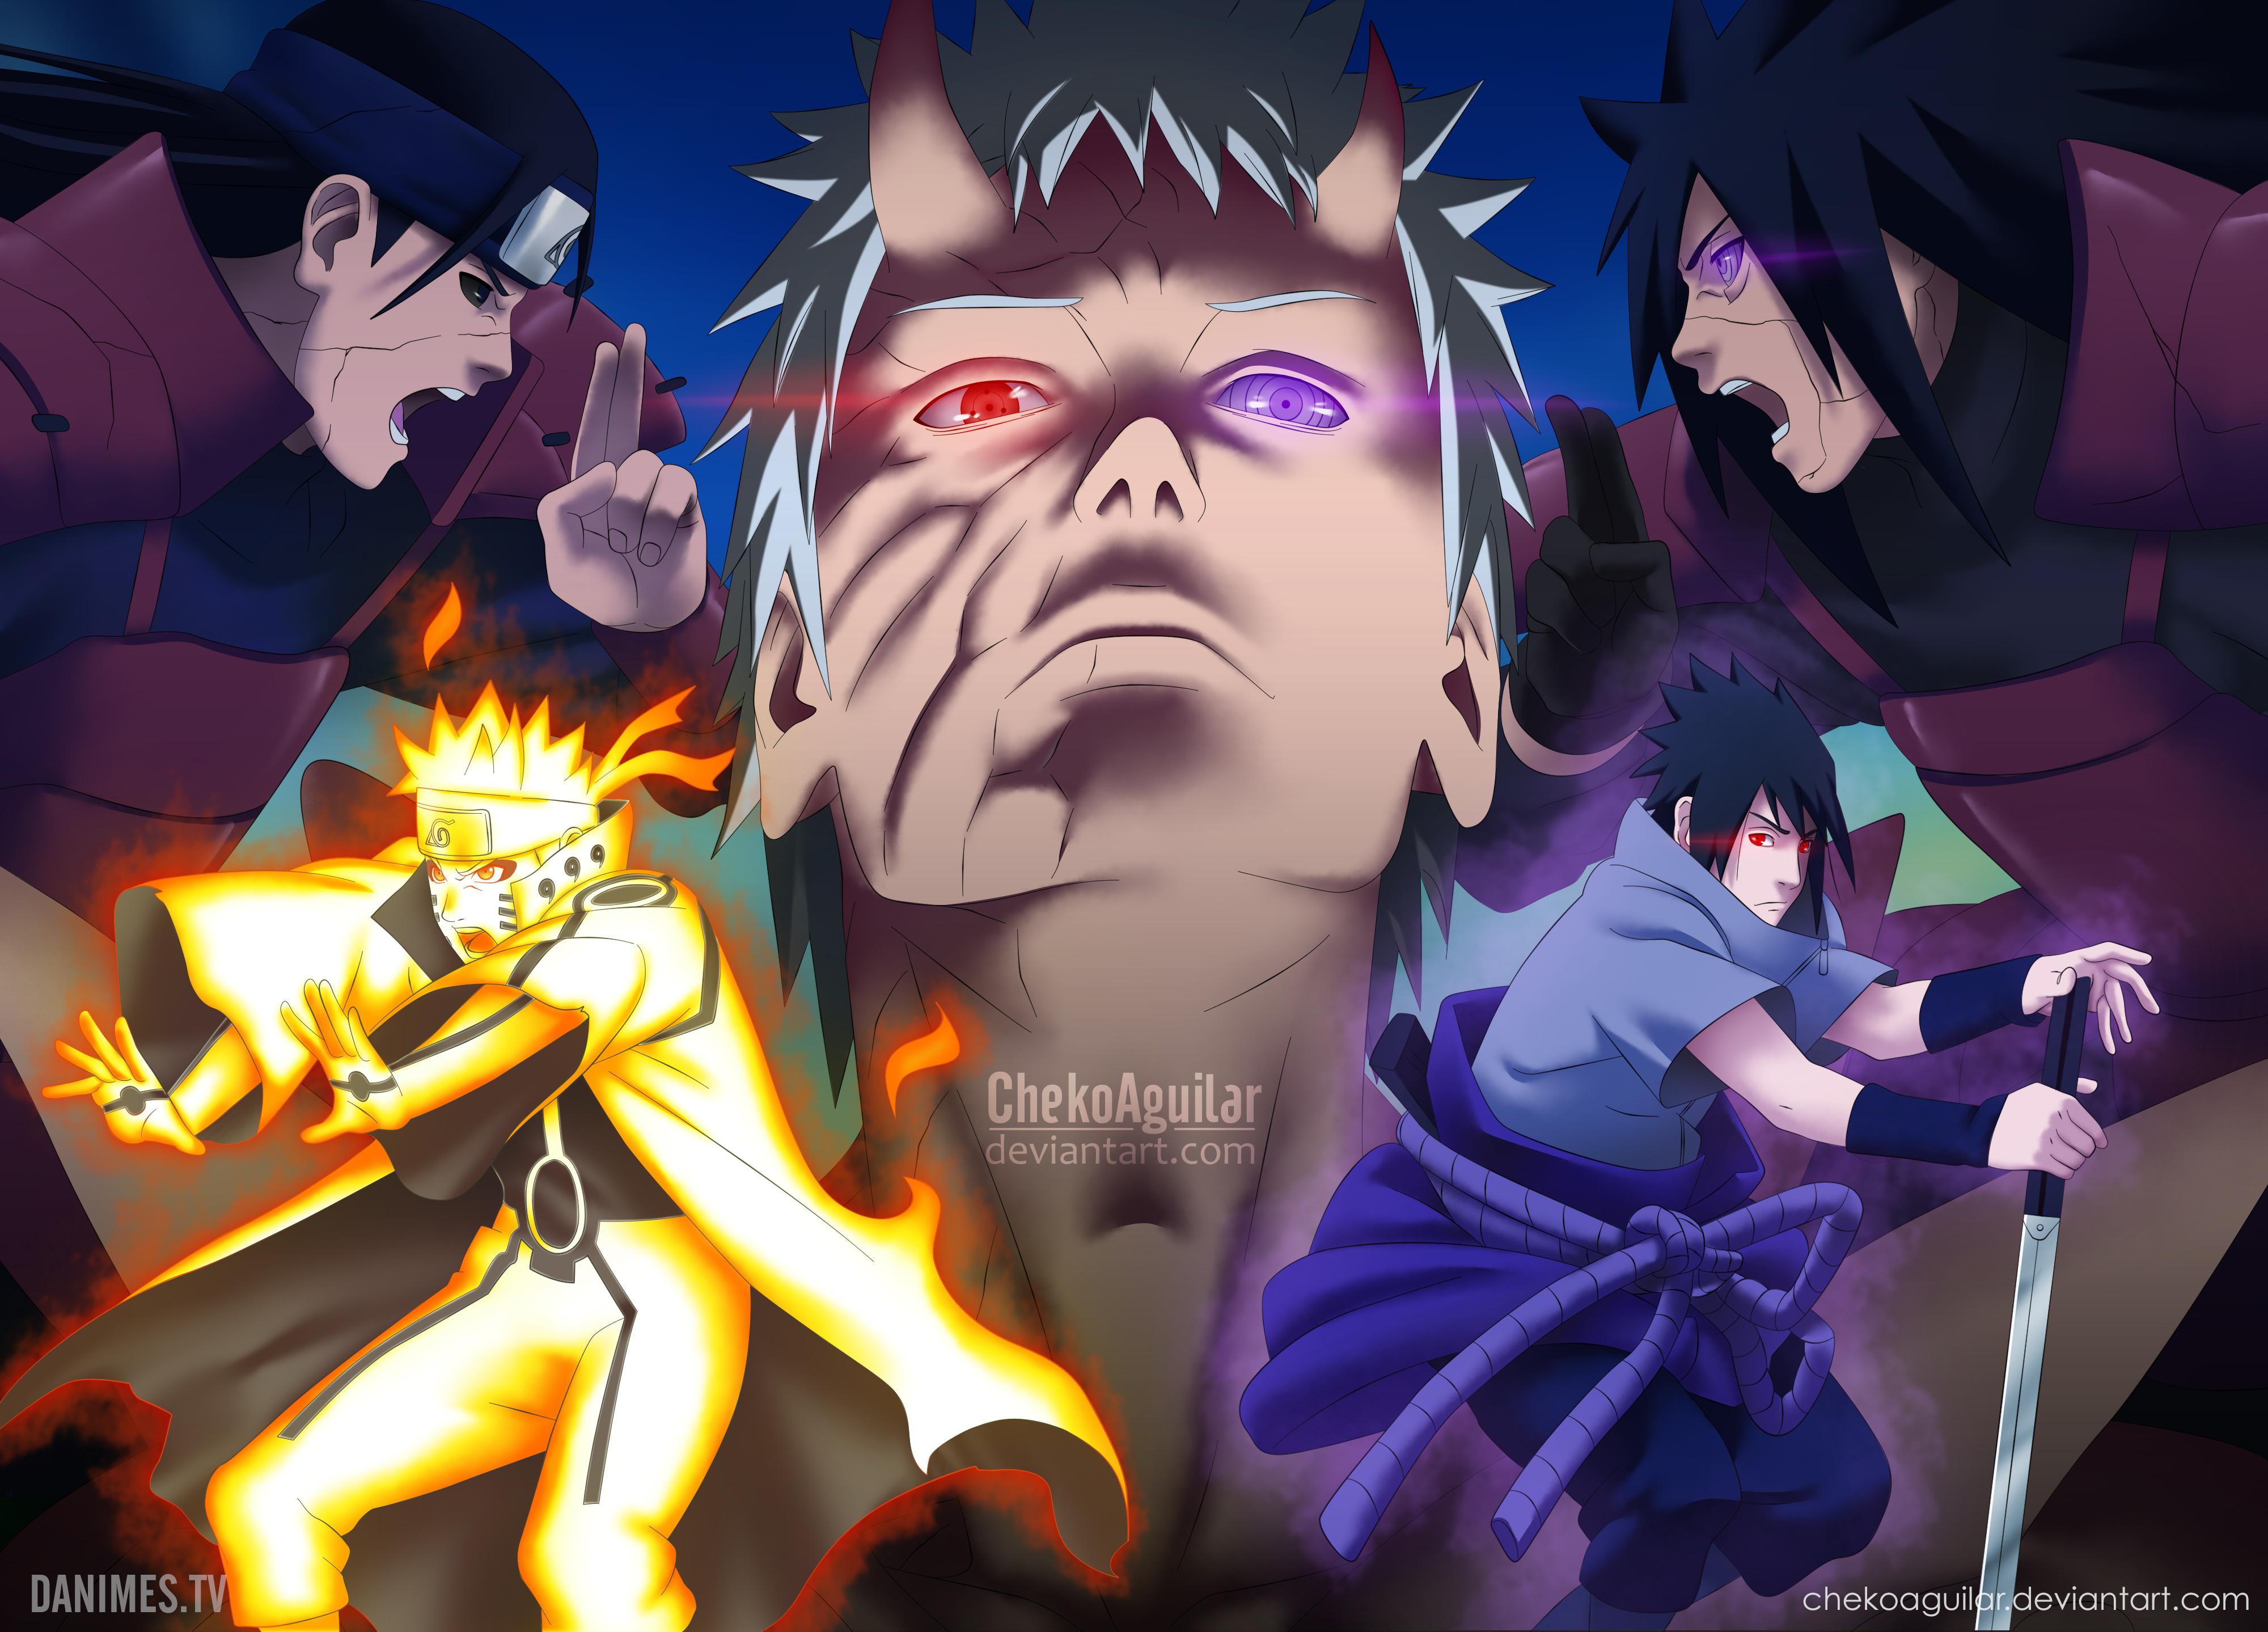 Naruto Manga Cover 14 years of Naruto by ChekoAguilar